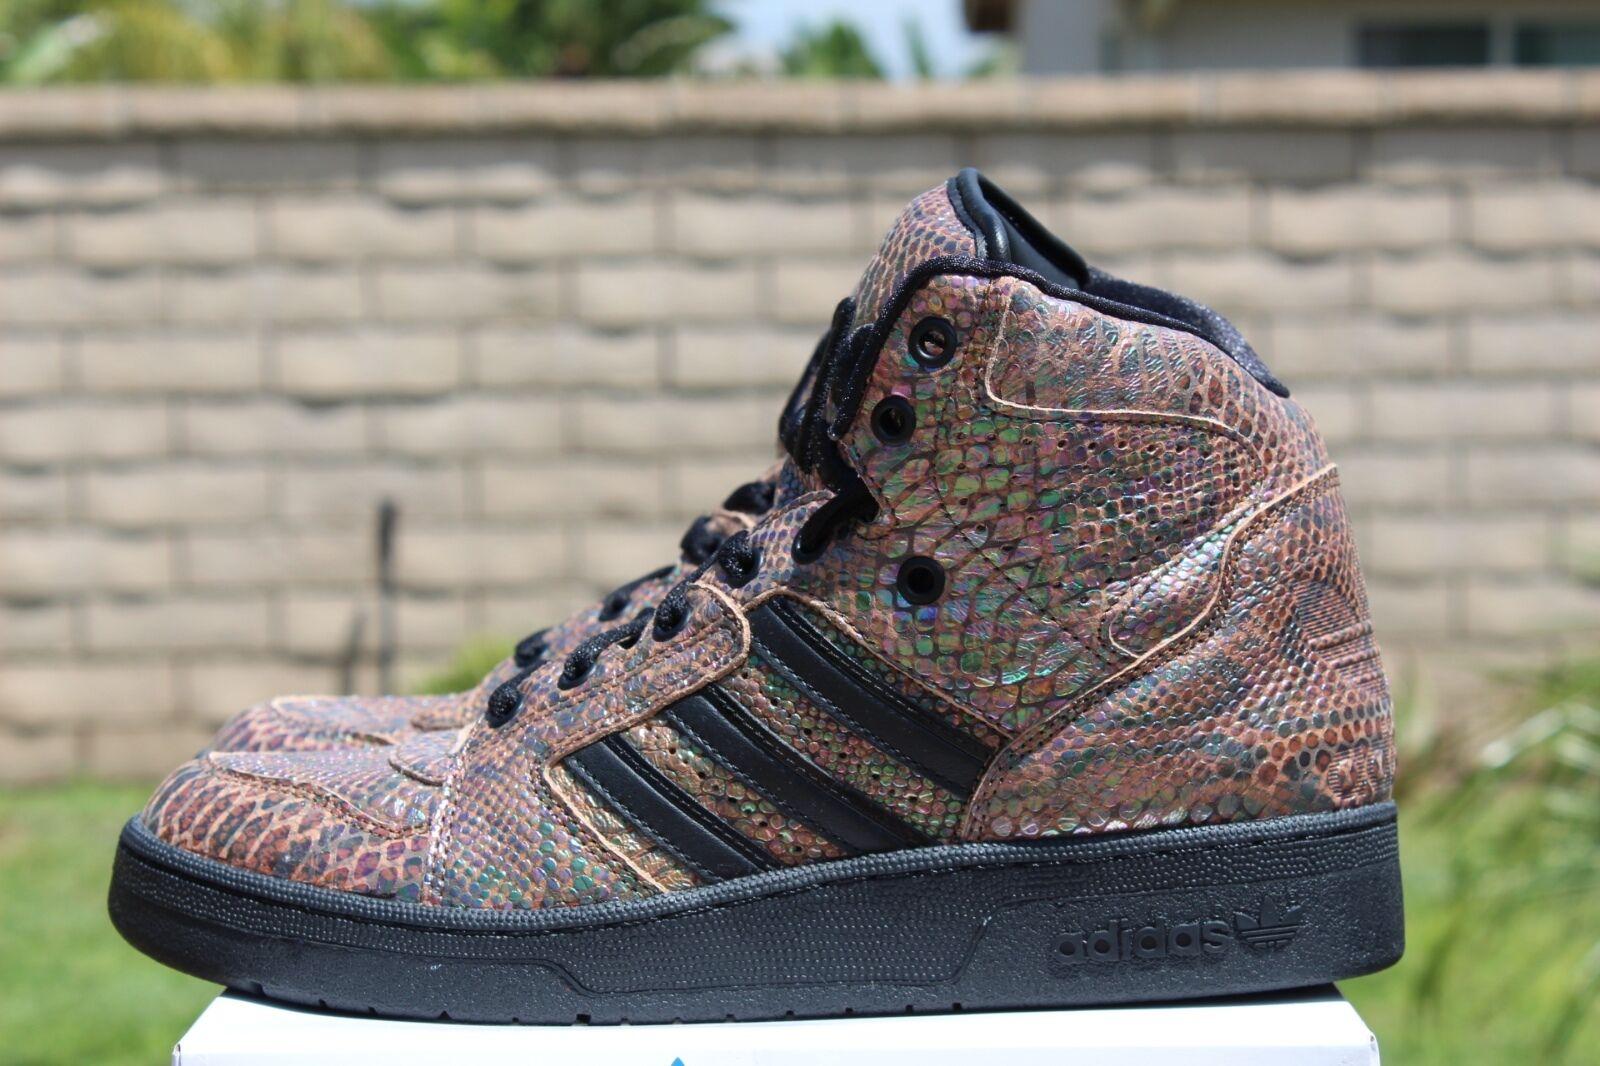 Adidas 4.5 obyo js jeremy scott instinkt - sz 4.5 Adidas schlangenhaut regenbogen schwarz g95753 b91b43